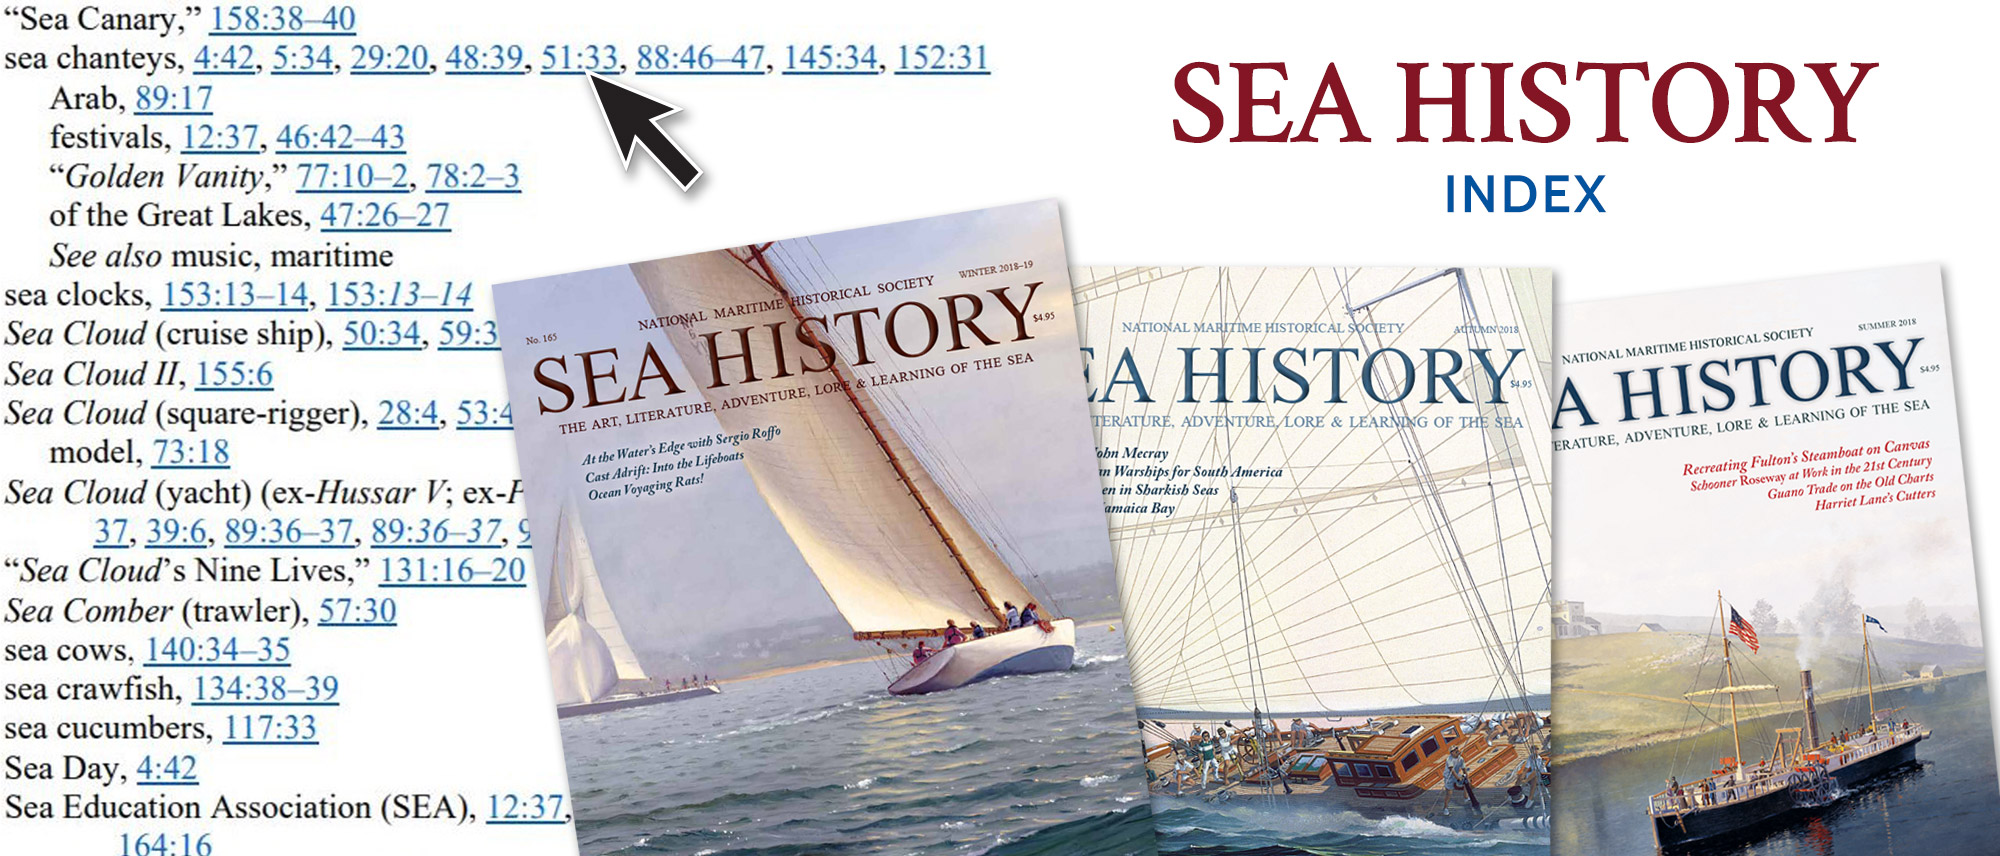 Sea History Index